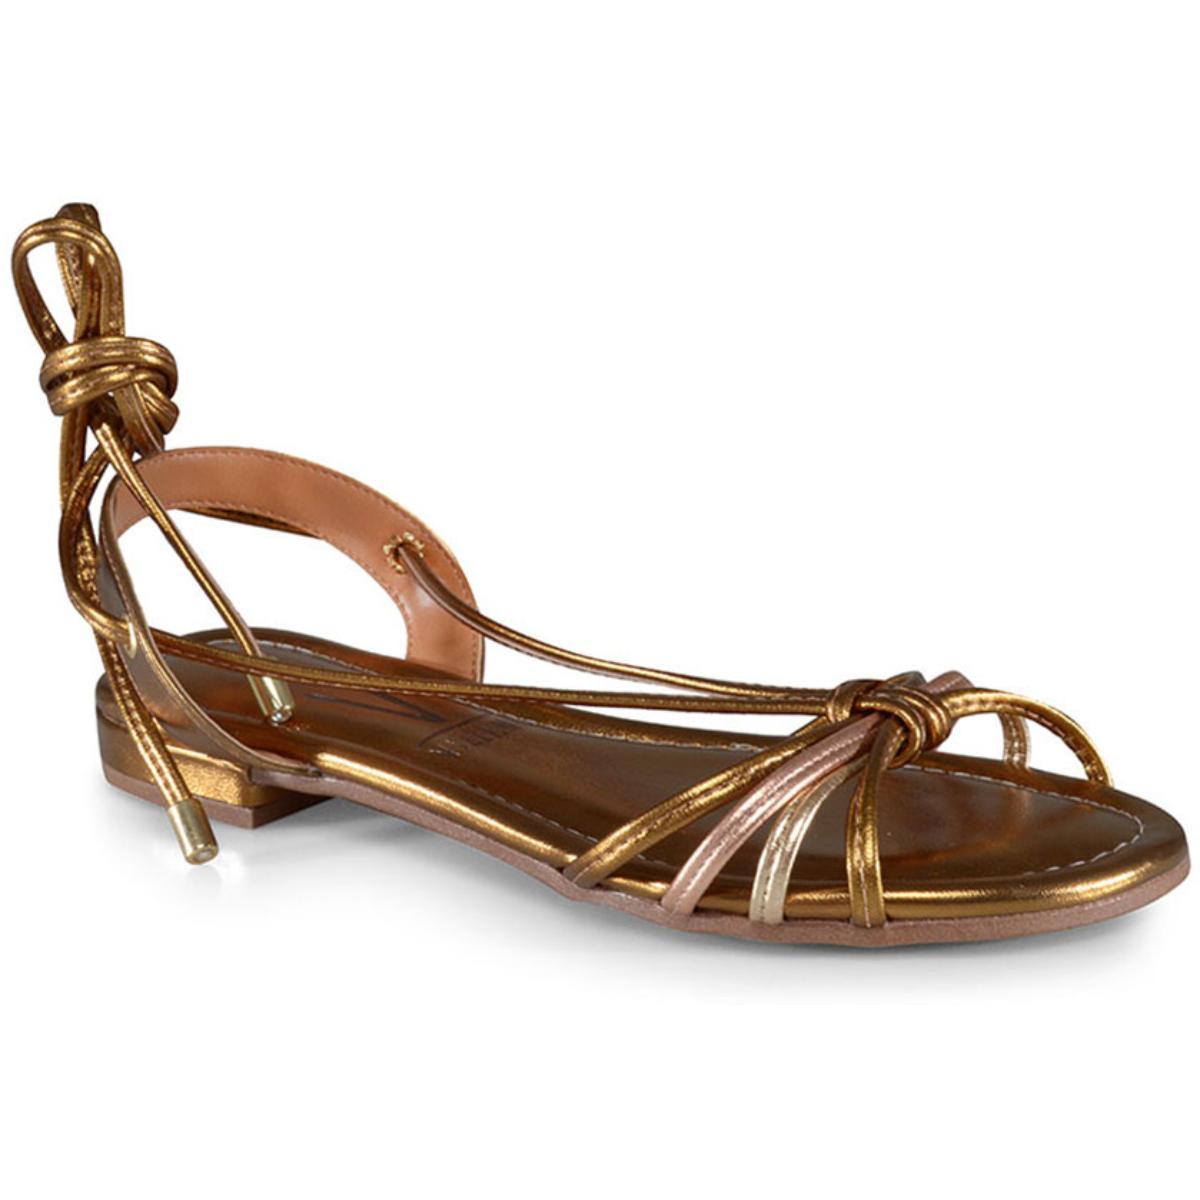 Sandália Feminina Vizzano 6370519 Bronze/ouro Rosado/dourado